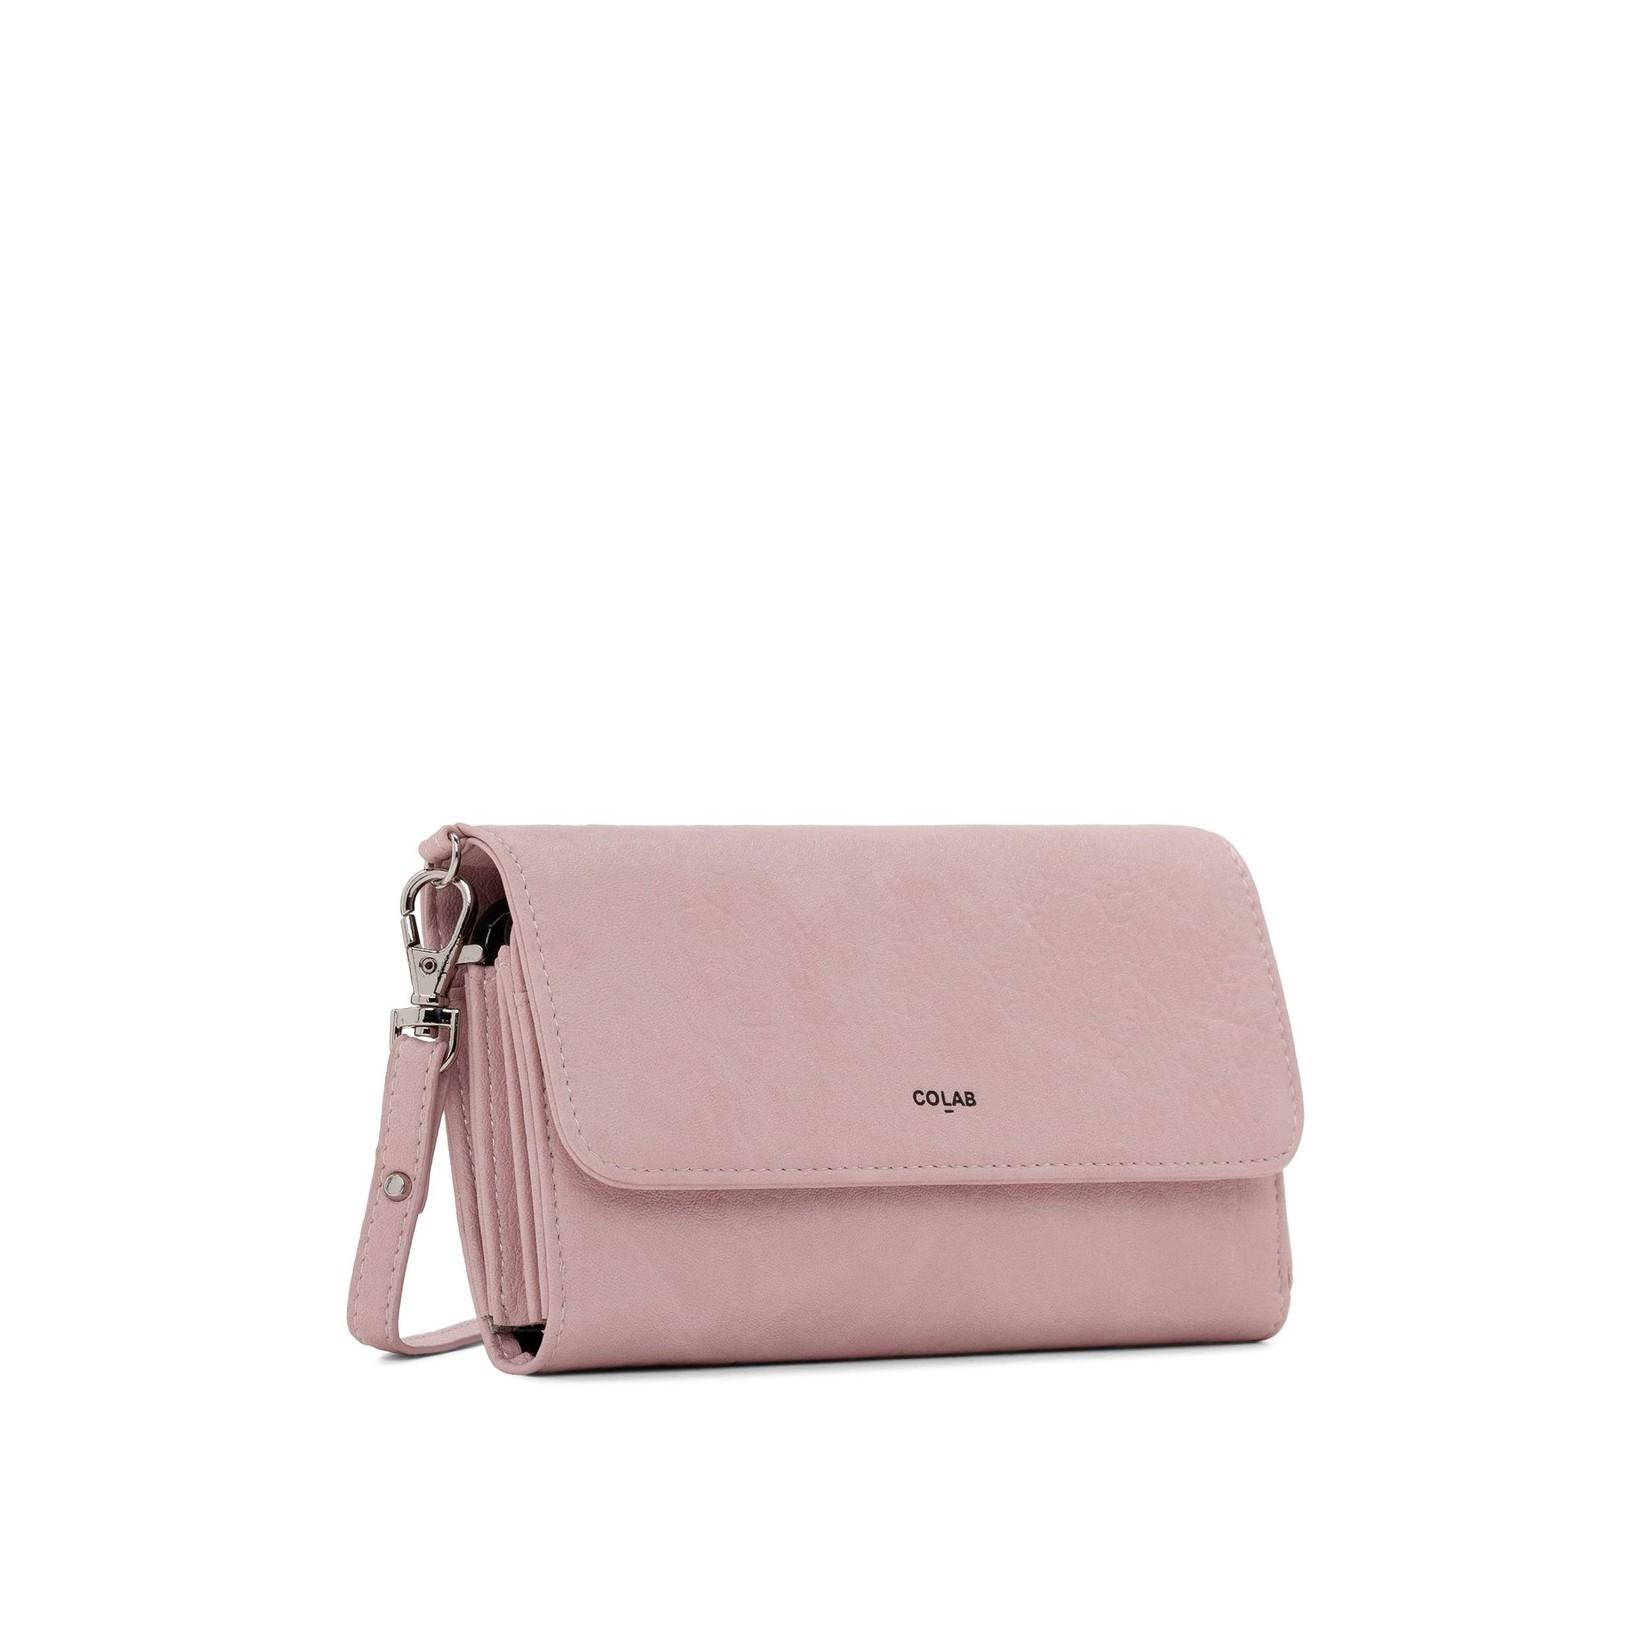 Co-lab Co-lab sac portefeuille rose